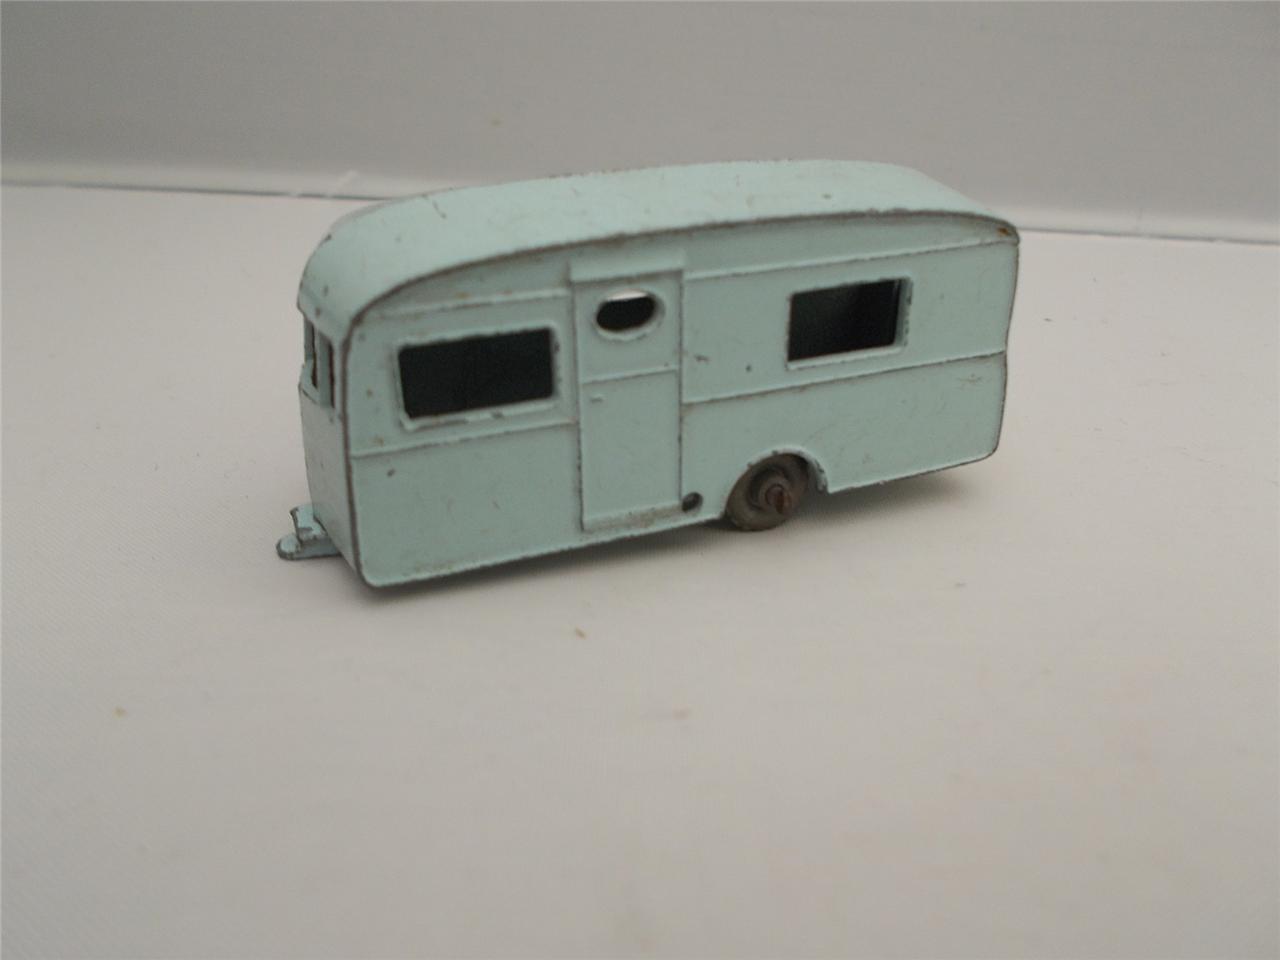 VINTAGE LESNEY BERKELEY CAVALIER Traino Caravan RARO ColoreeE verde azul N. 23 in buonissima condizione